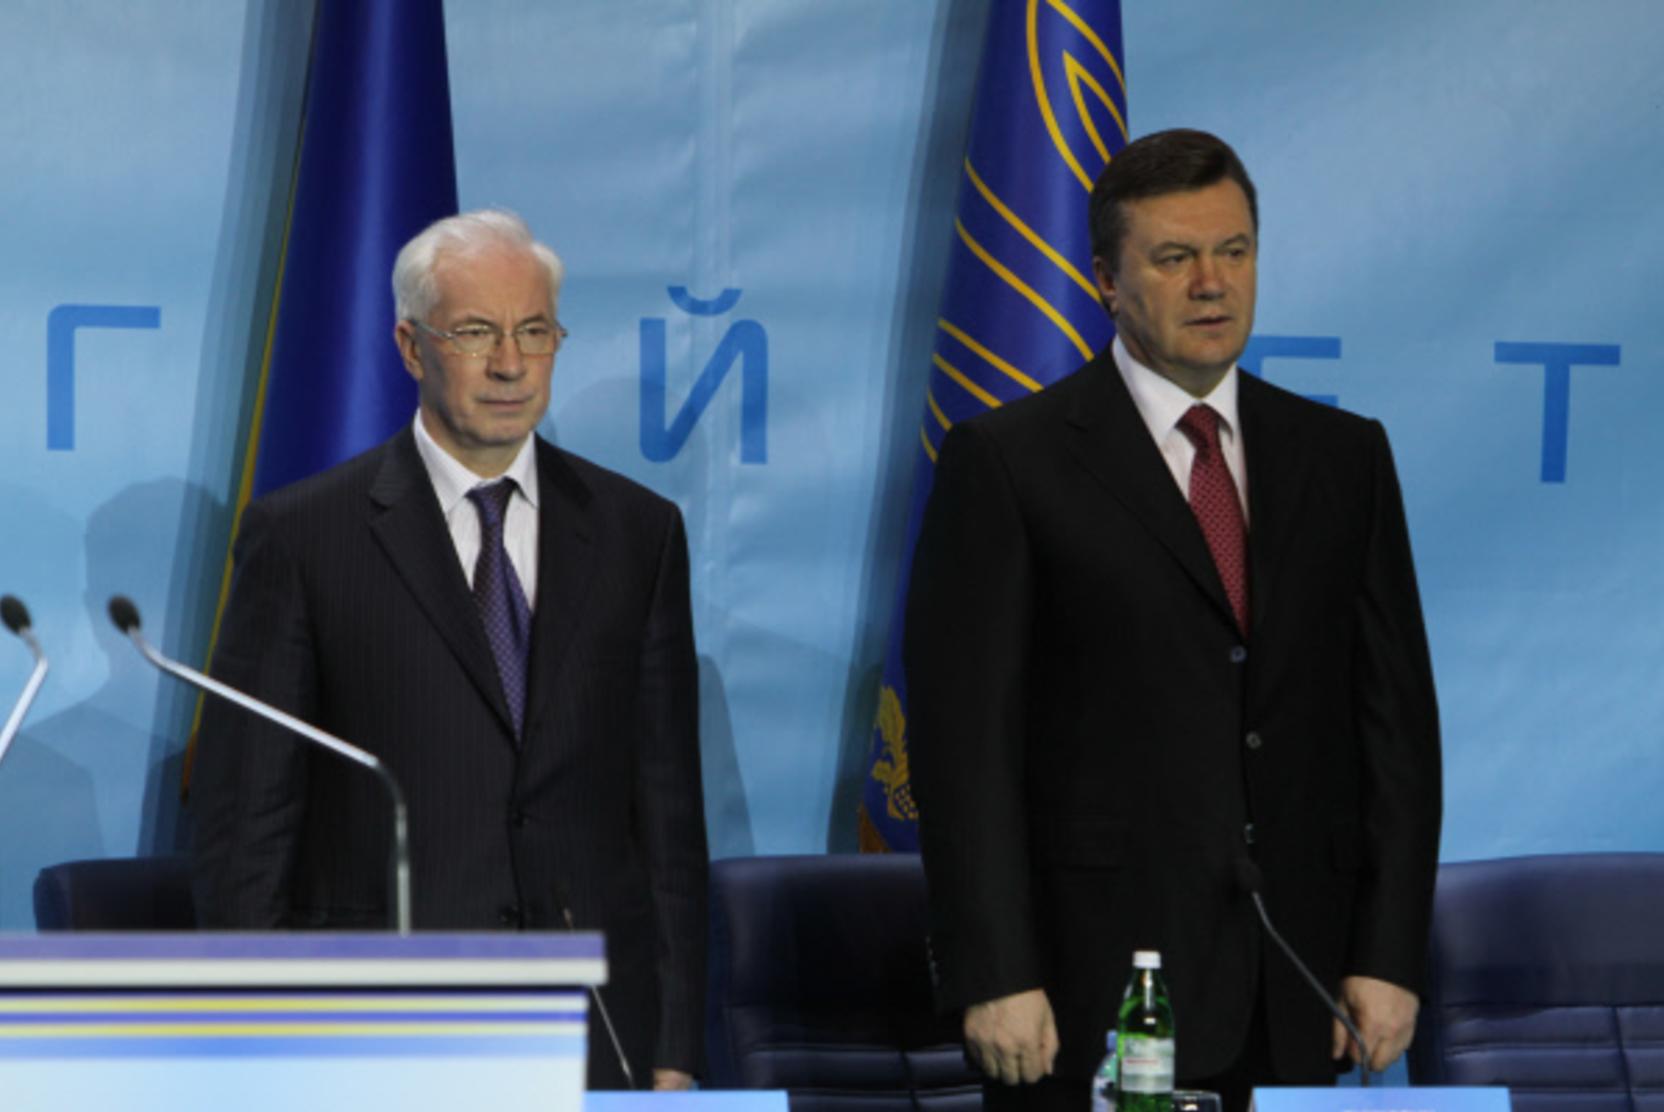 Суд на Украине заочно арестовал экс-премьера Азарова